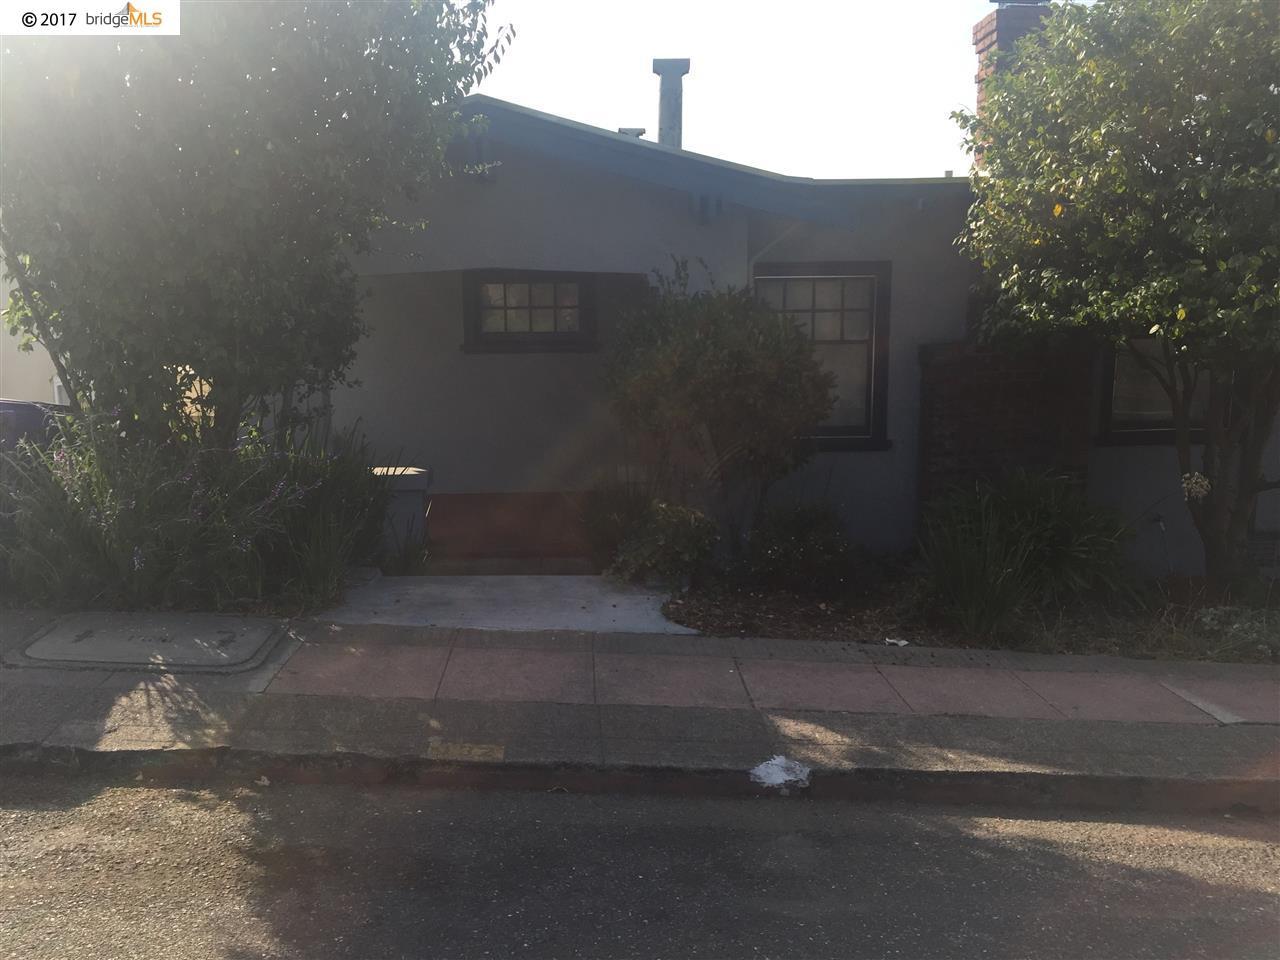 Single Family Home for Rent at 132 Moraga 132 Moraga Piedmont, California 94611 United States